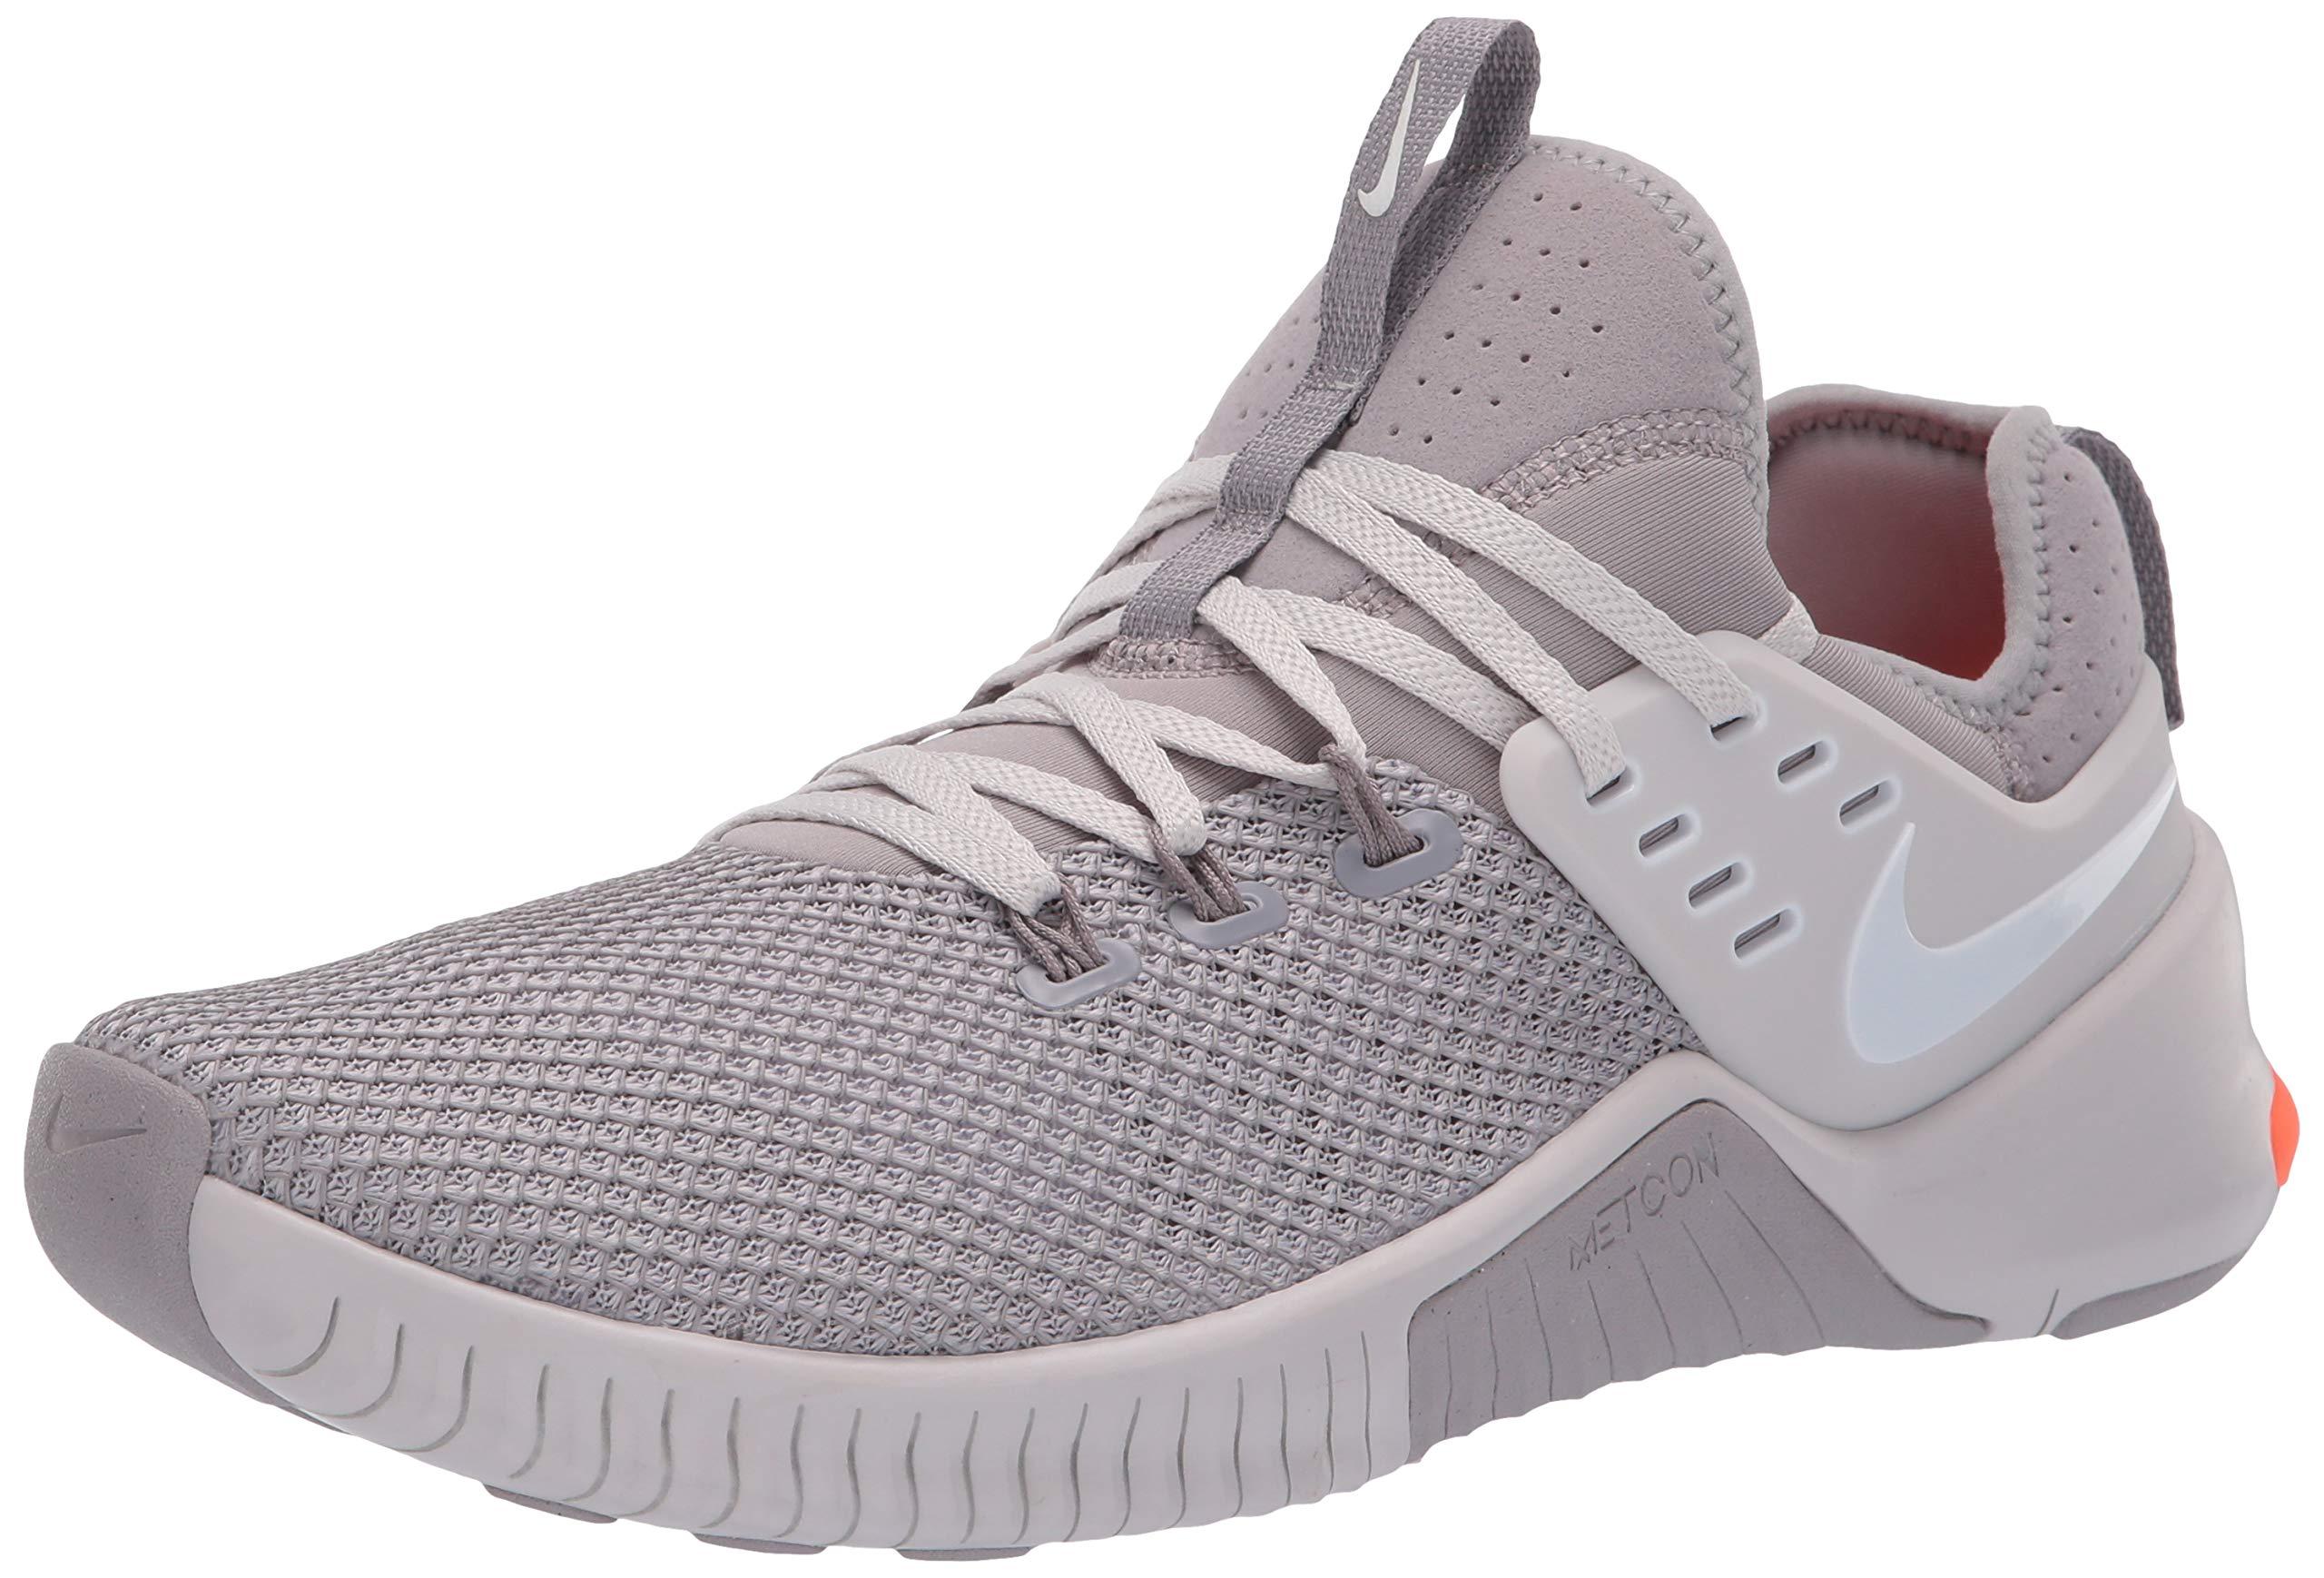 Nike Men's Metcon Free Training Shoe Atmosphere Grey/White-VAST Grey 8.0